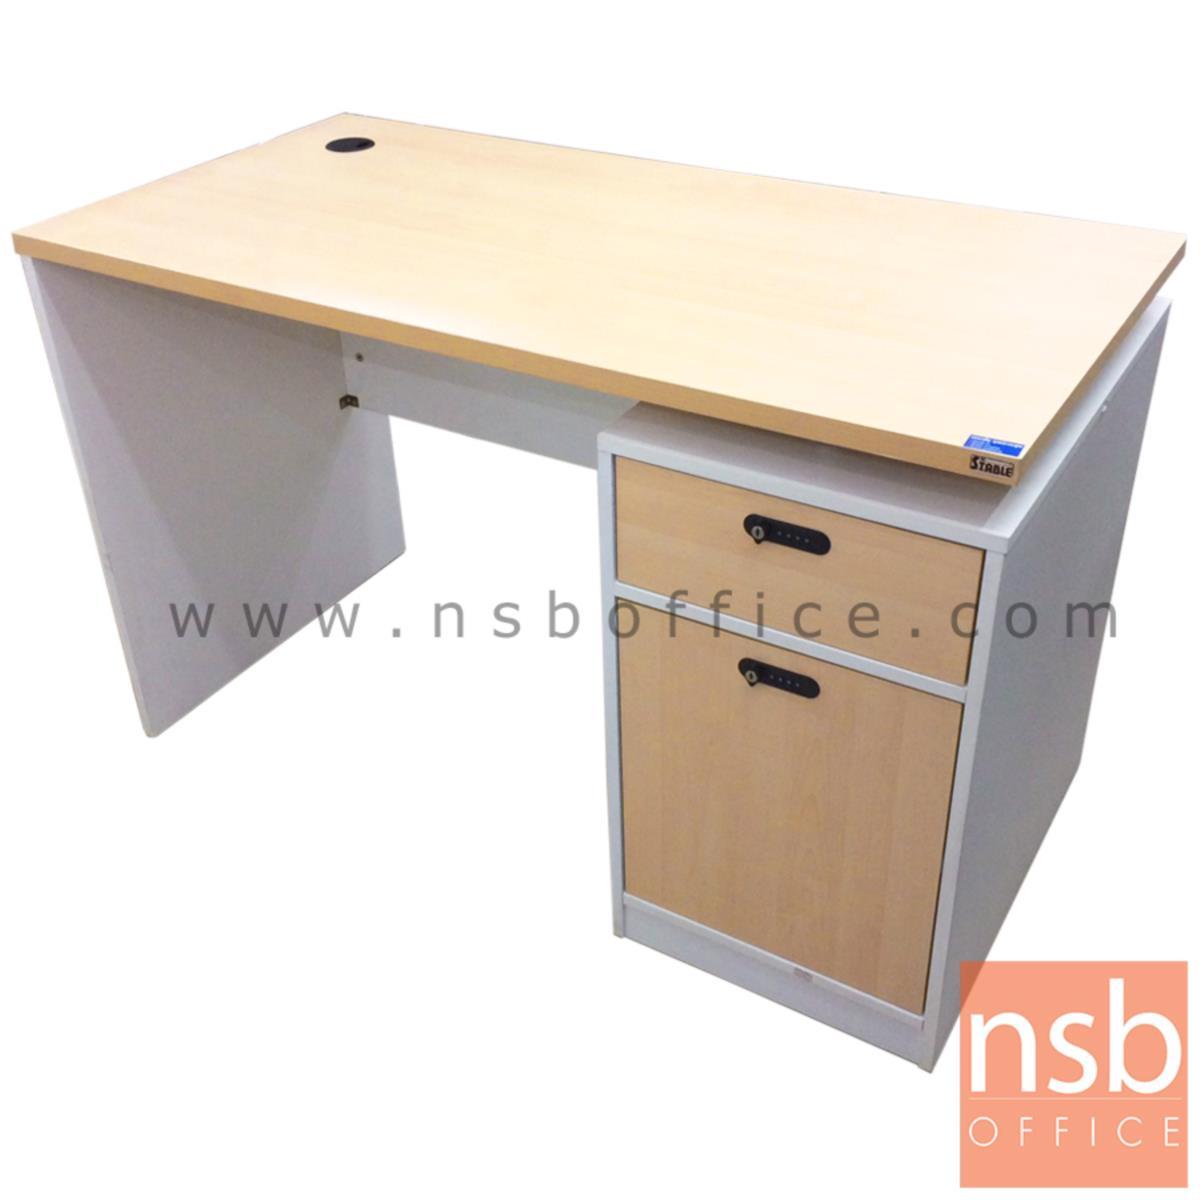 A12A074:โต๊ะทำงาน 1 ลิ้นชัก  1 บานเปิด รุ่น Darin (ดาริน) ขนาด 120W cm. มีกุญแจล็อครหัส